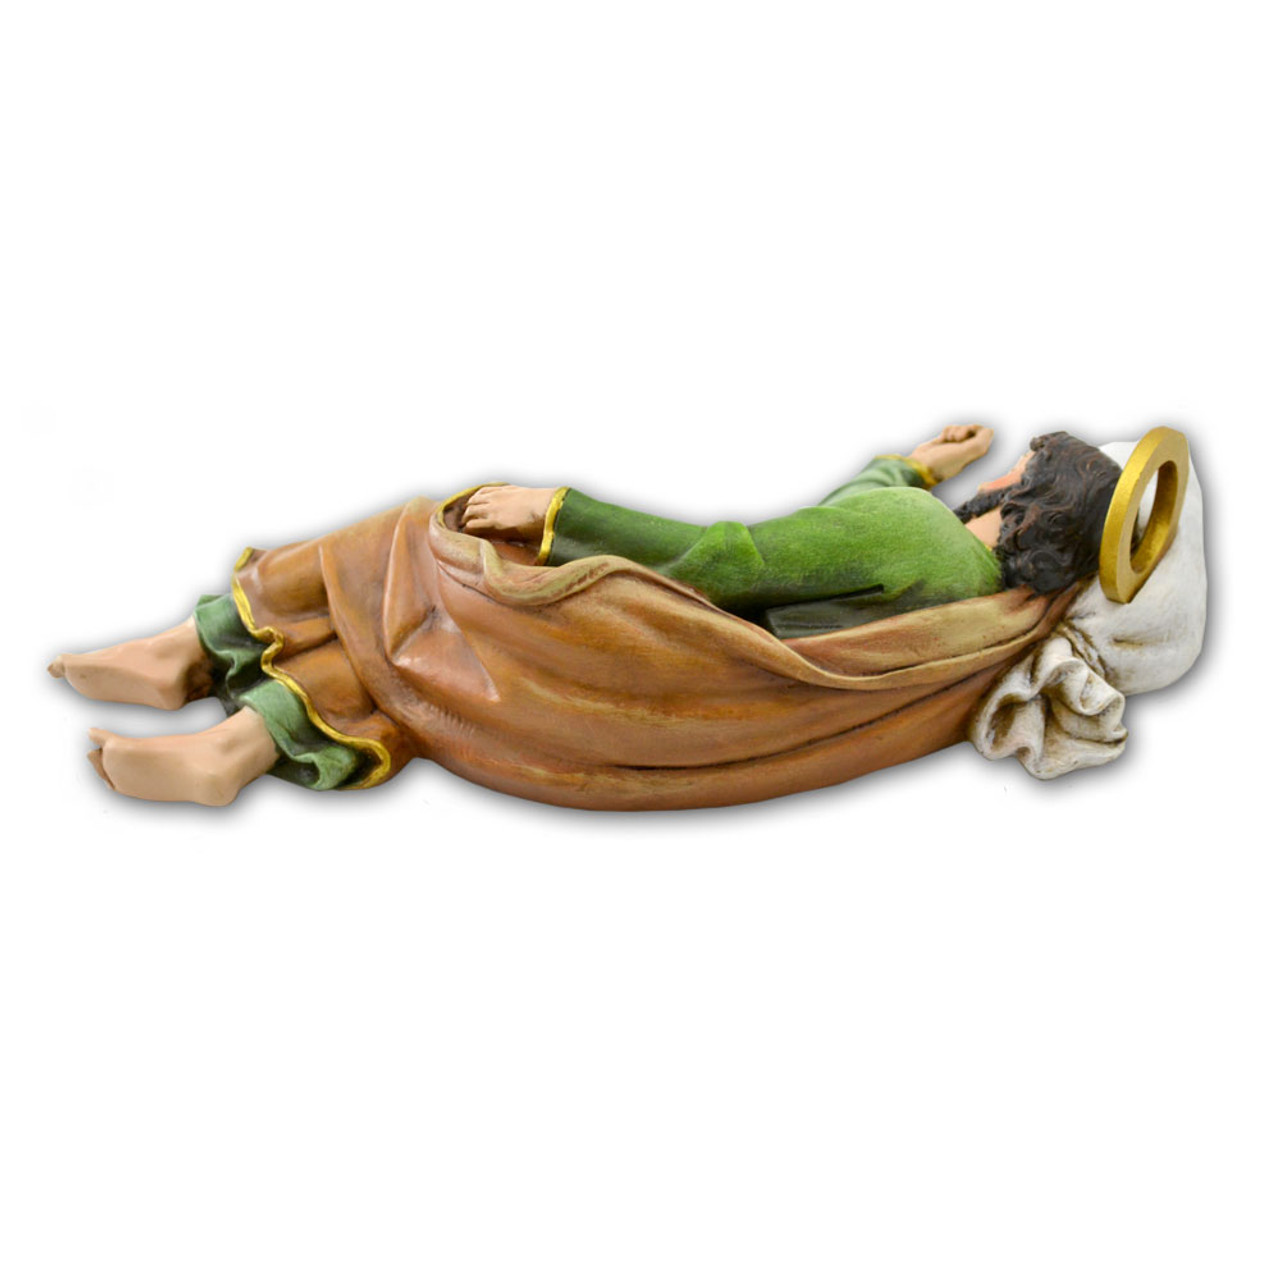 St. Joseph Sleeping Statue